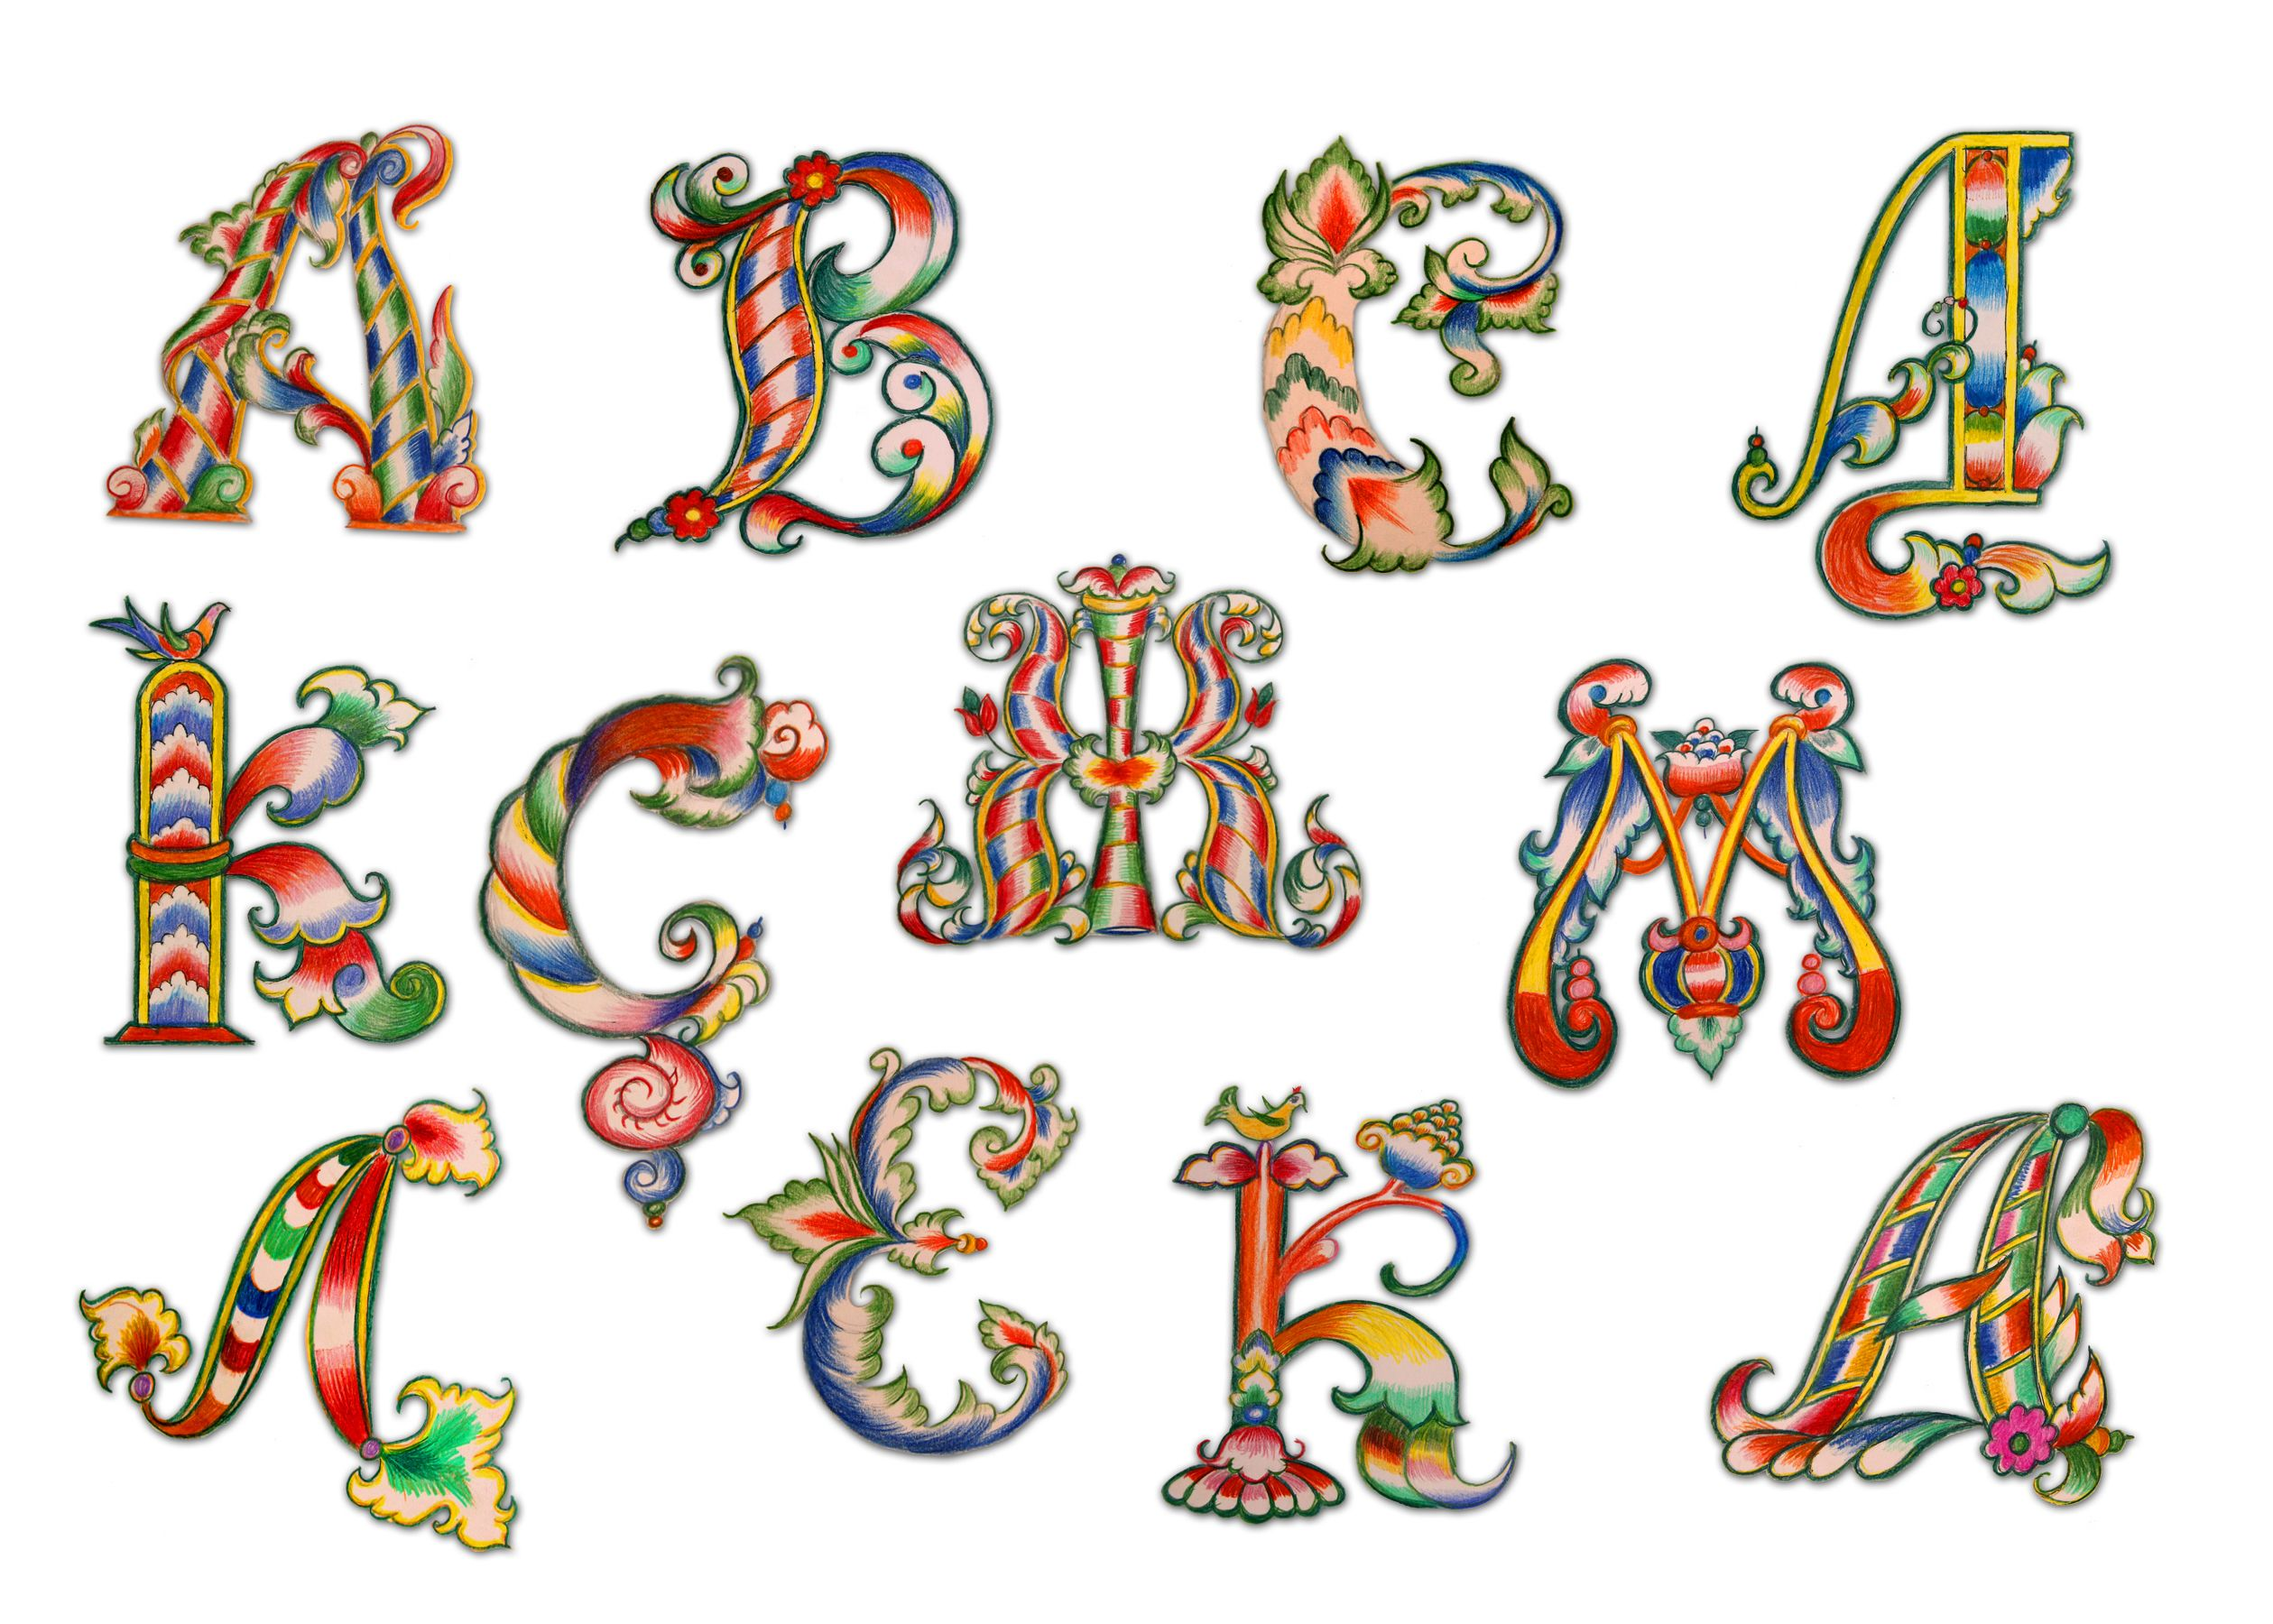 декоративный русский алфавит картинки ошибки